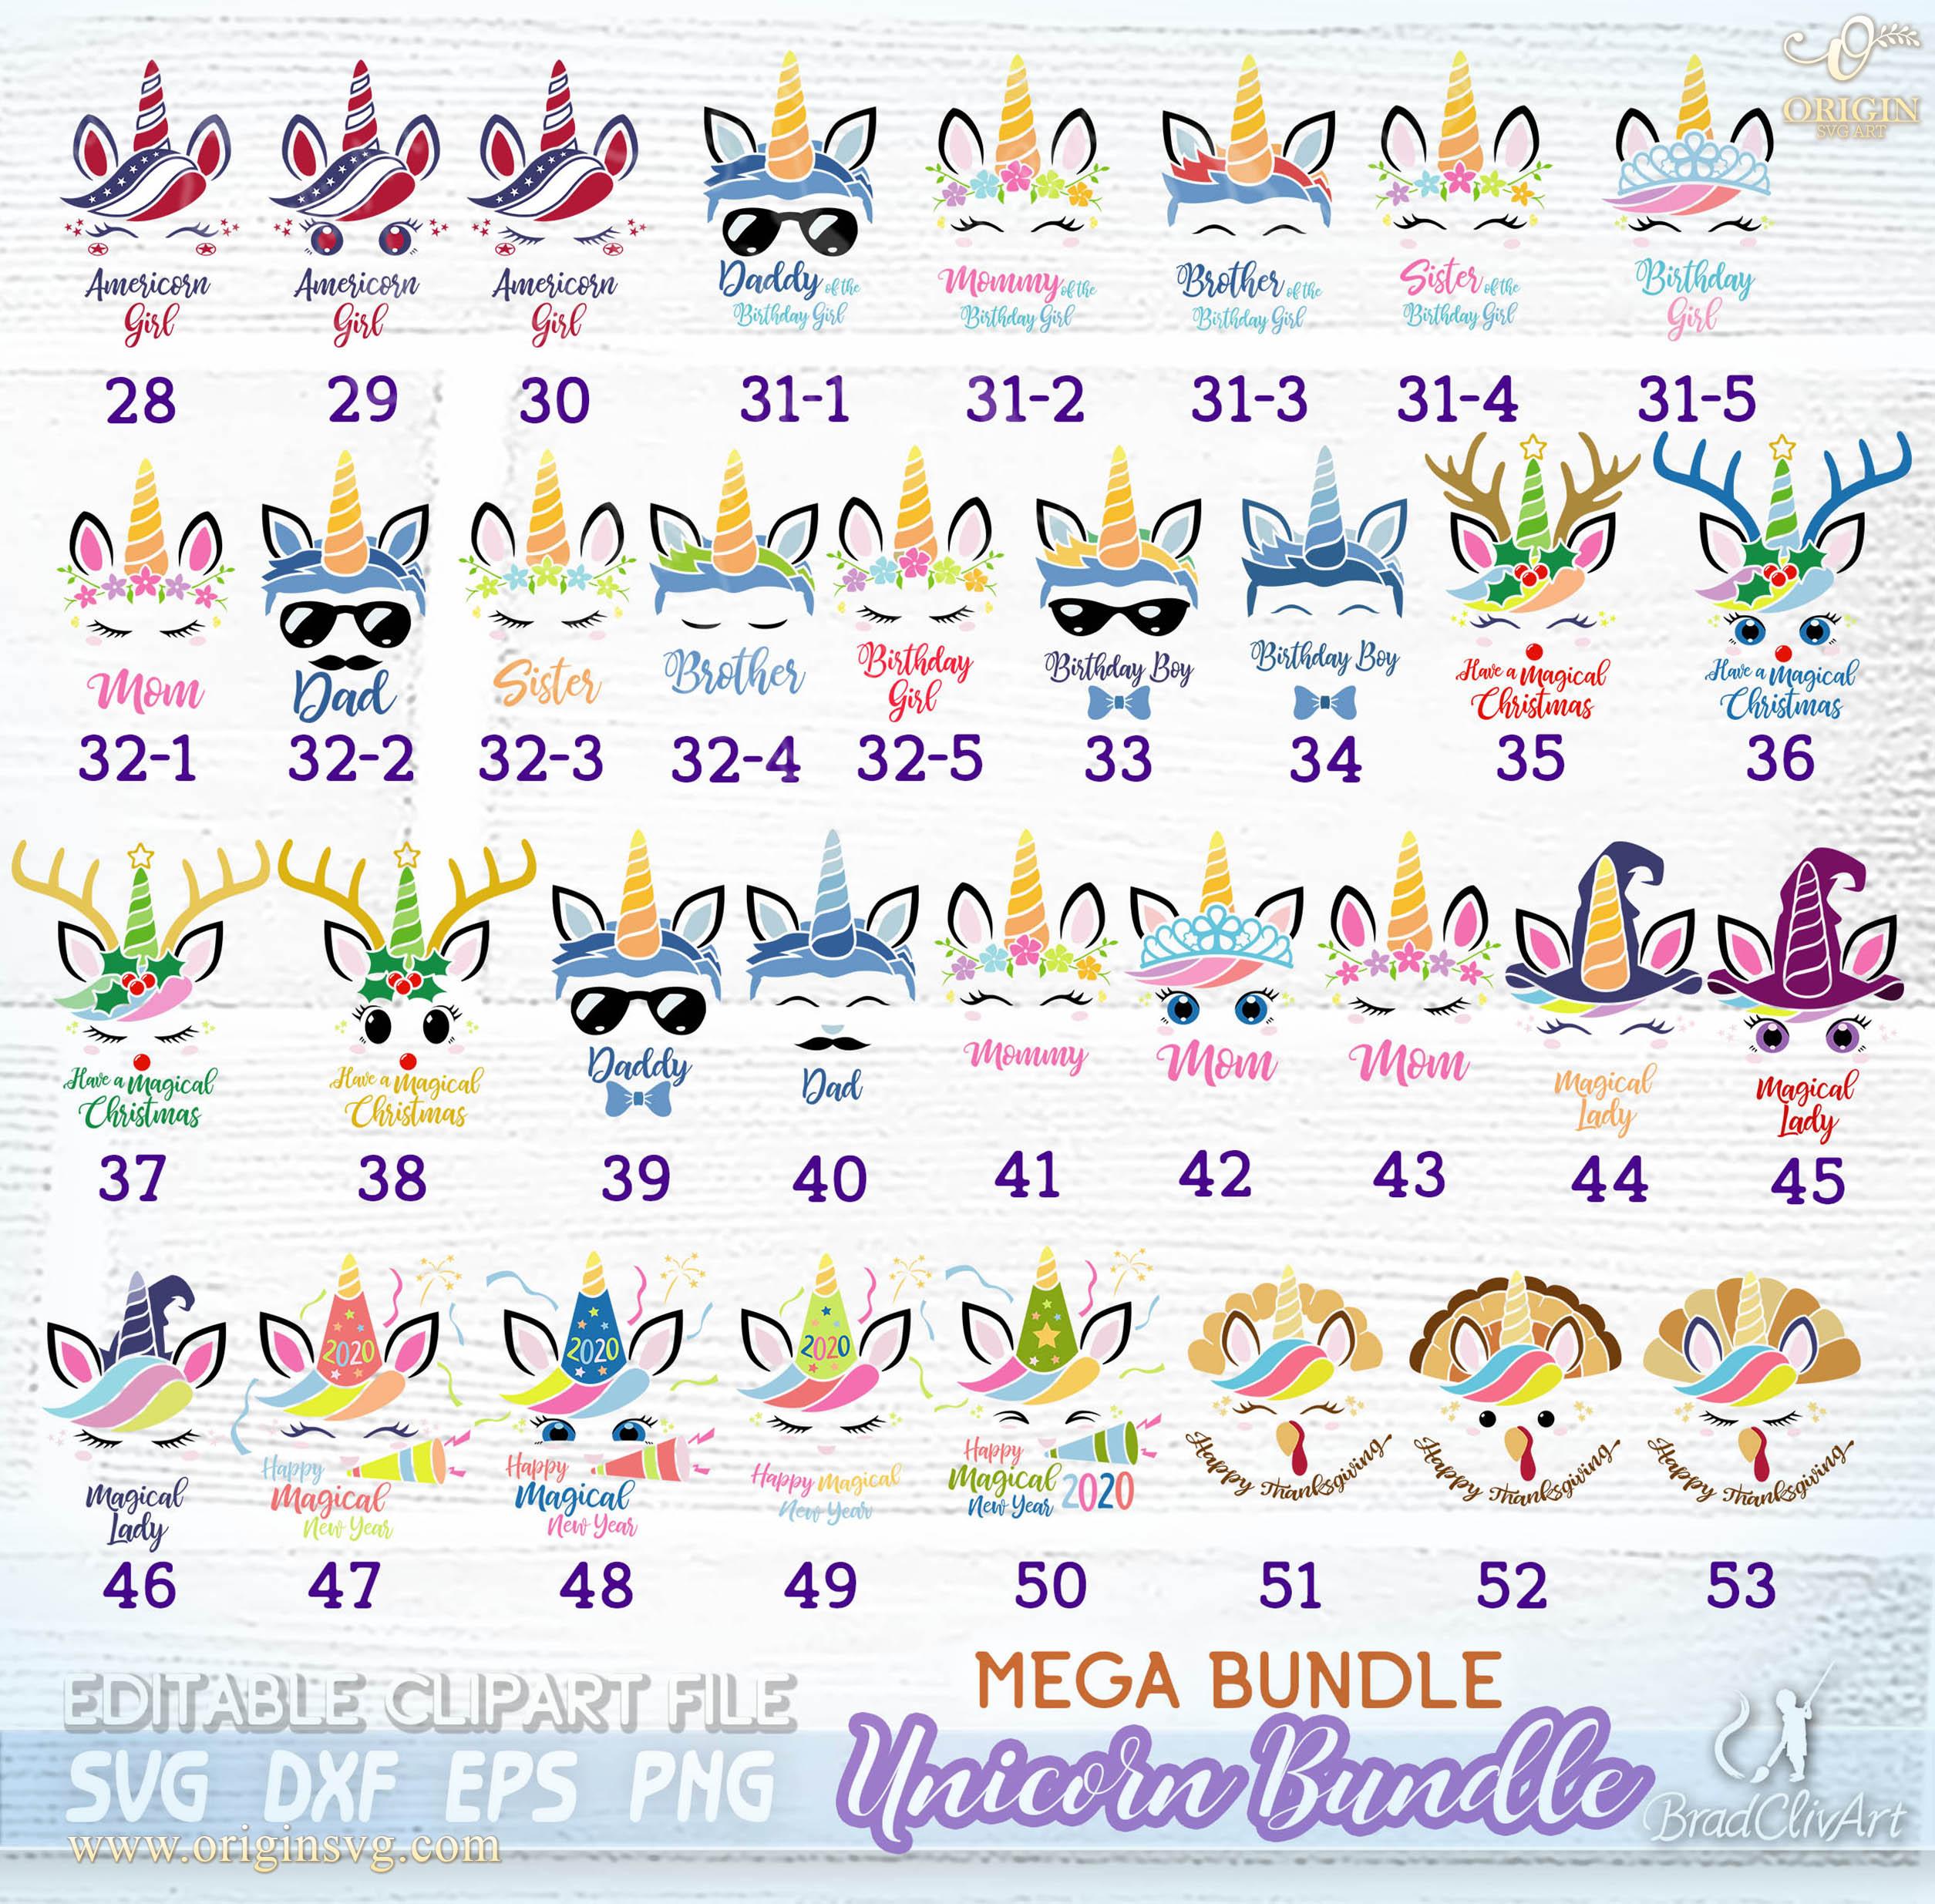 Unicorn Bundle Svg All Unicorns In Shop Cut File For Cricut And Silhouette